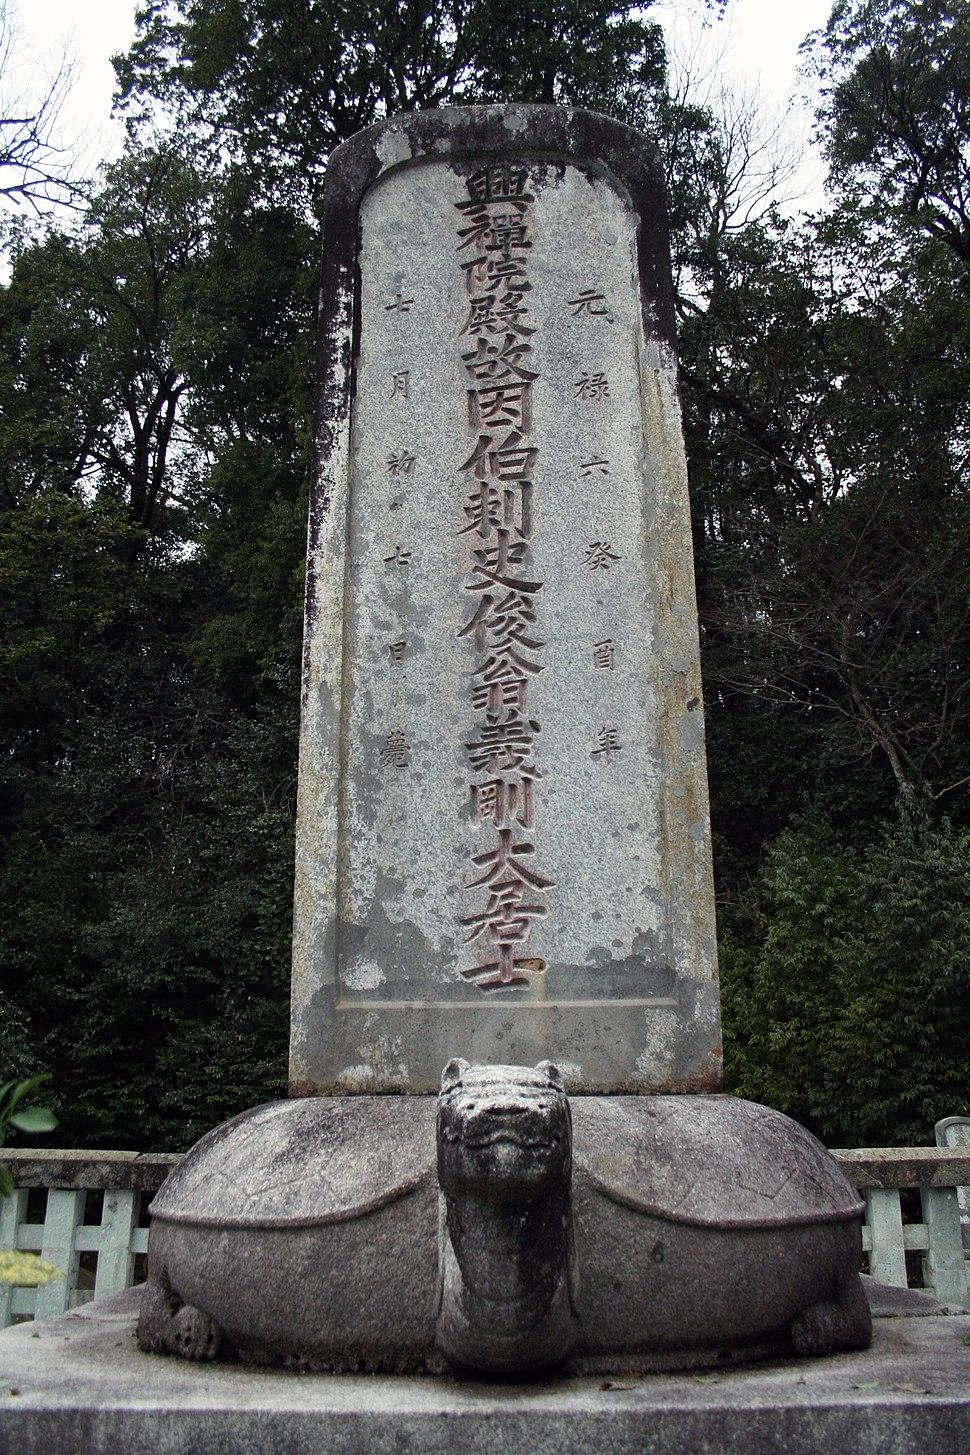 Tottori feudal lord Ikedas cemetery 065